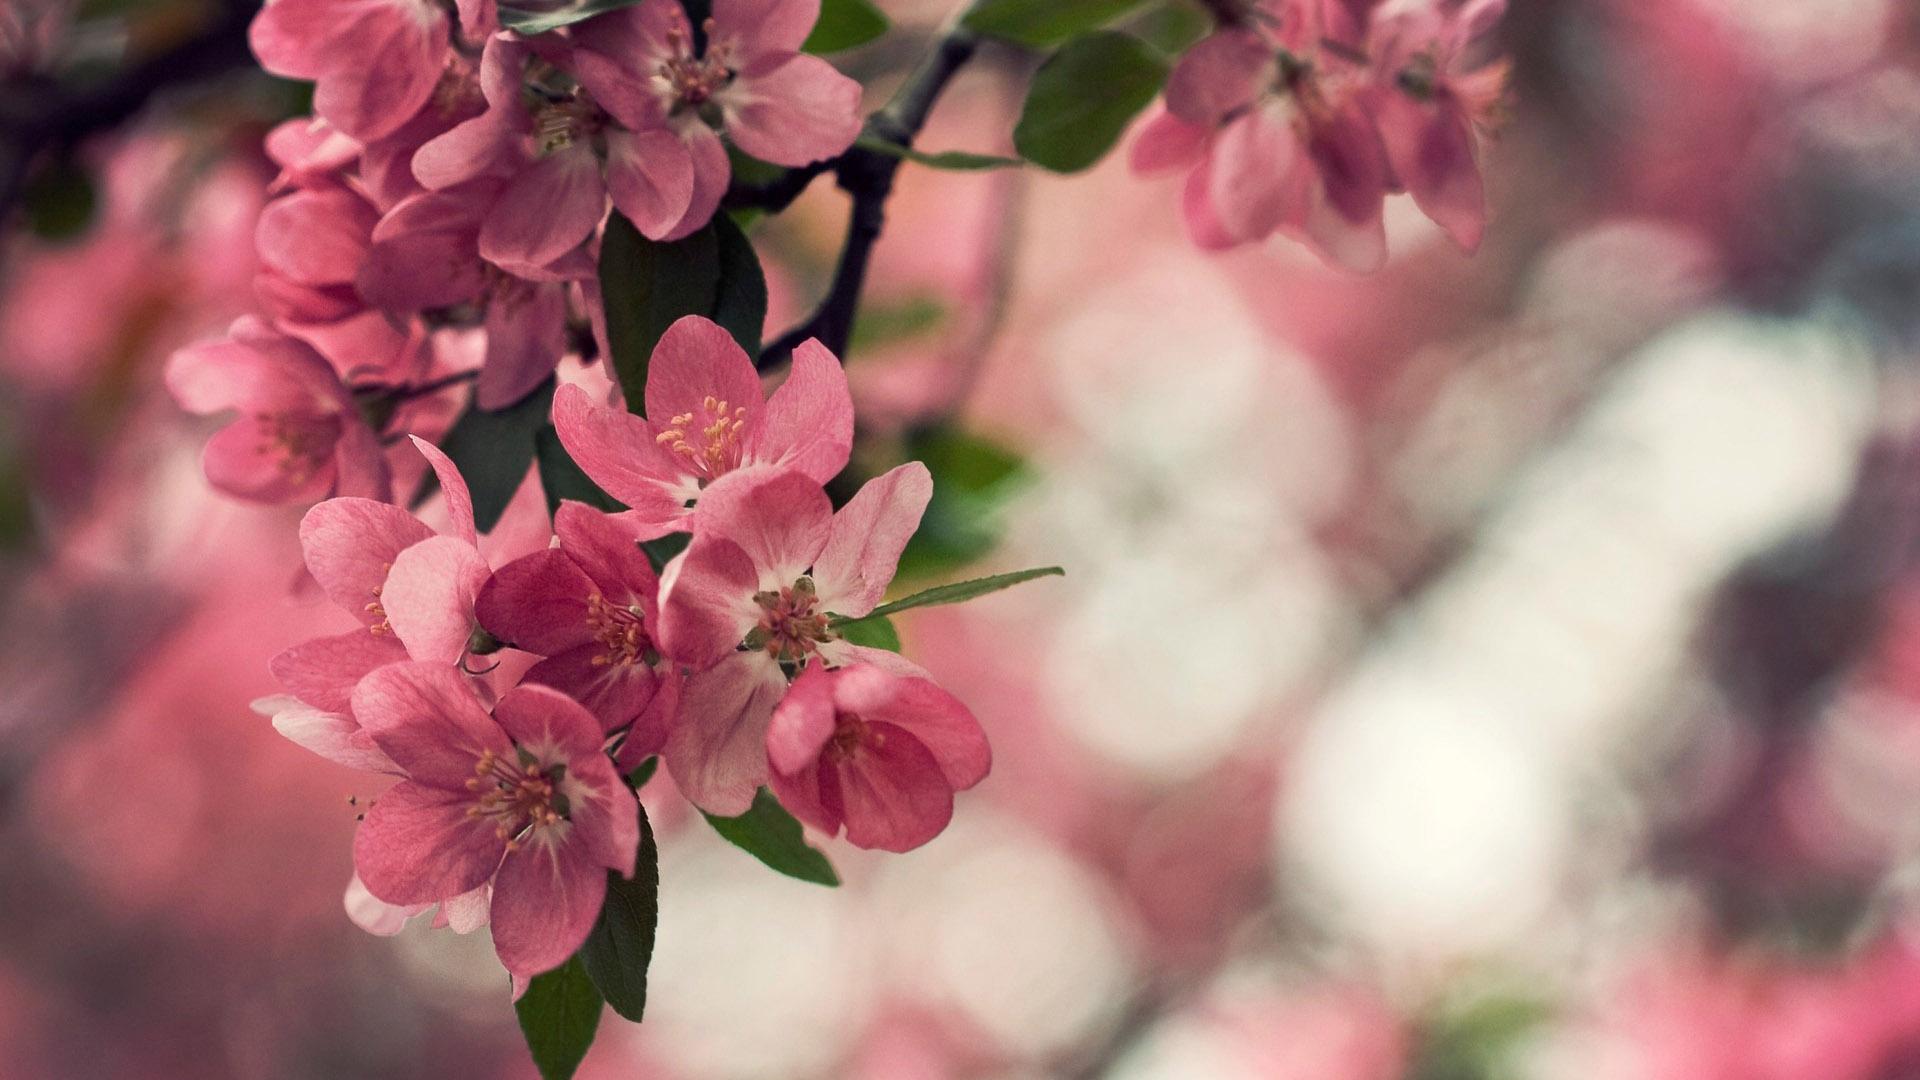 Prema rose productions llc spring - Flower wallpaper dp ...